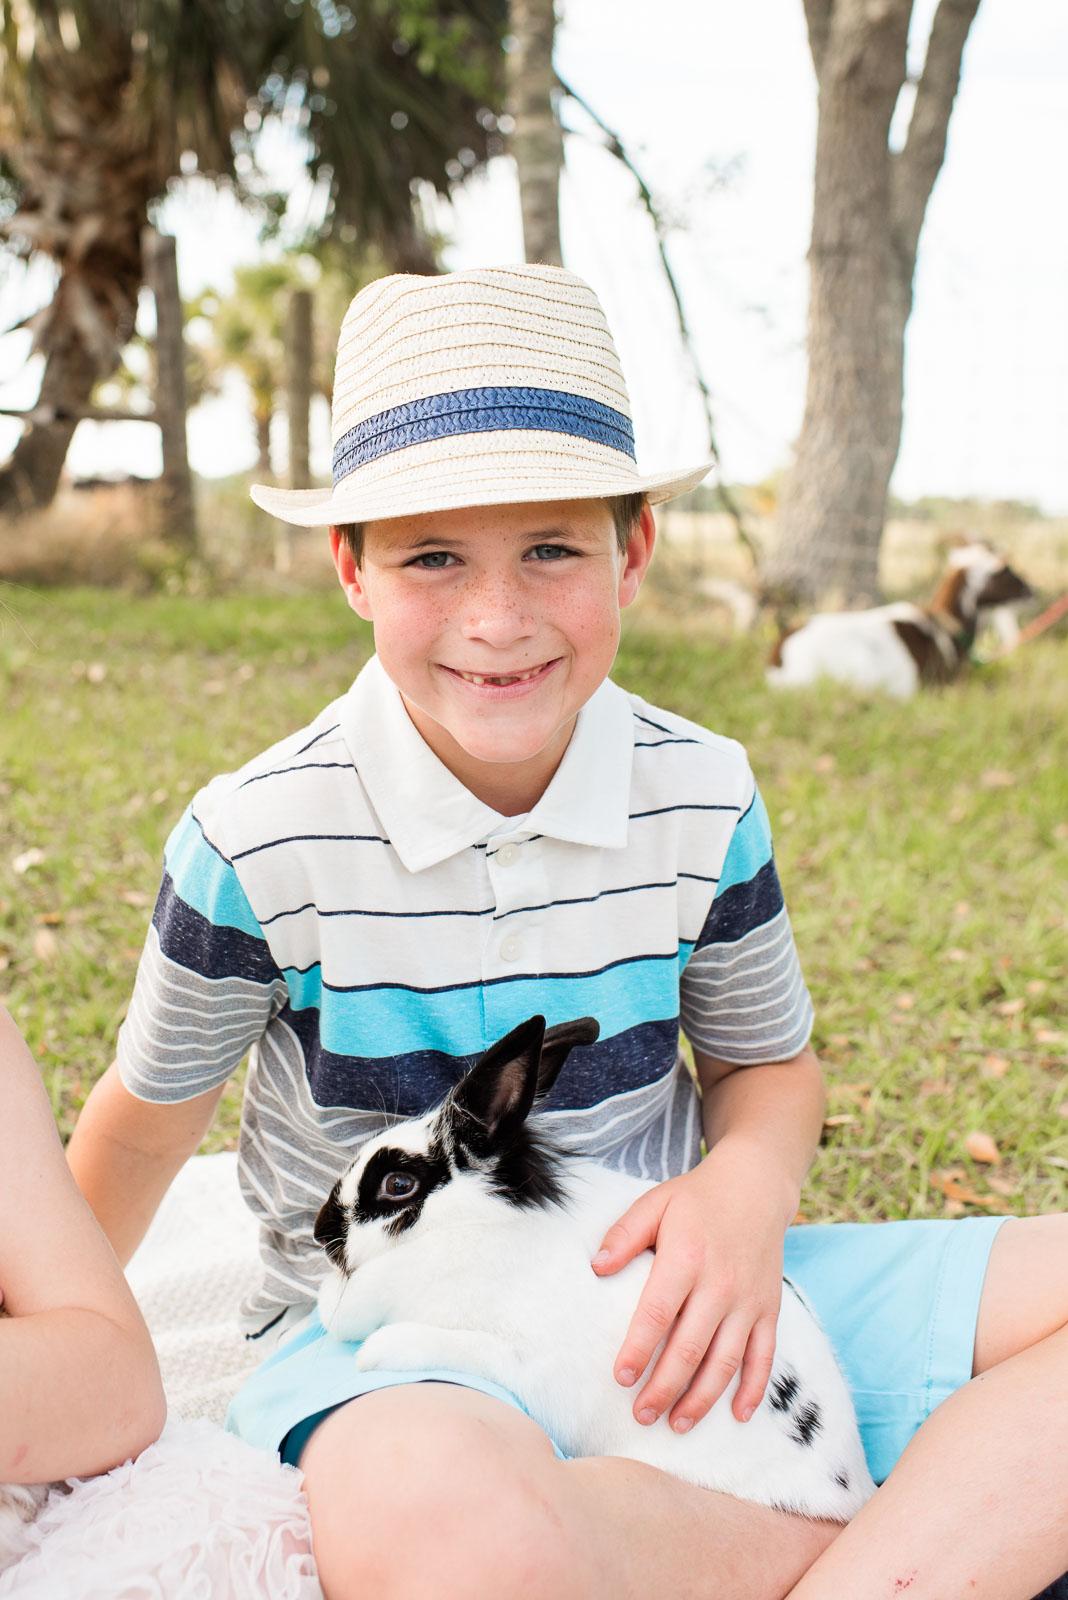 easter-photo-sessions-children-animals-02-6.jpg